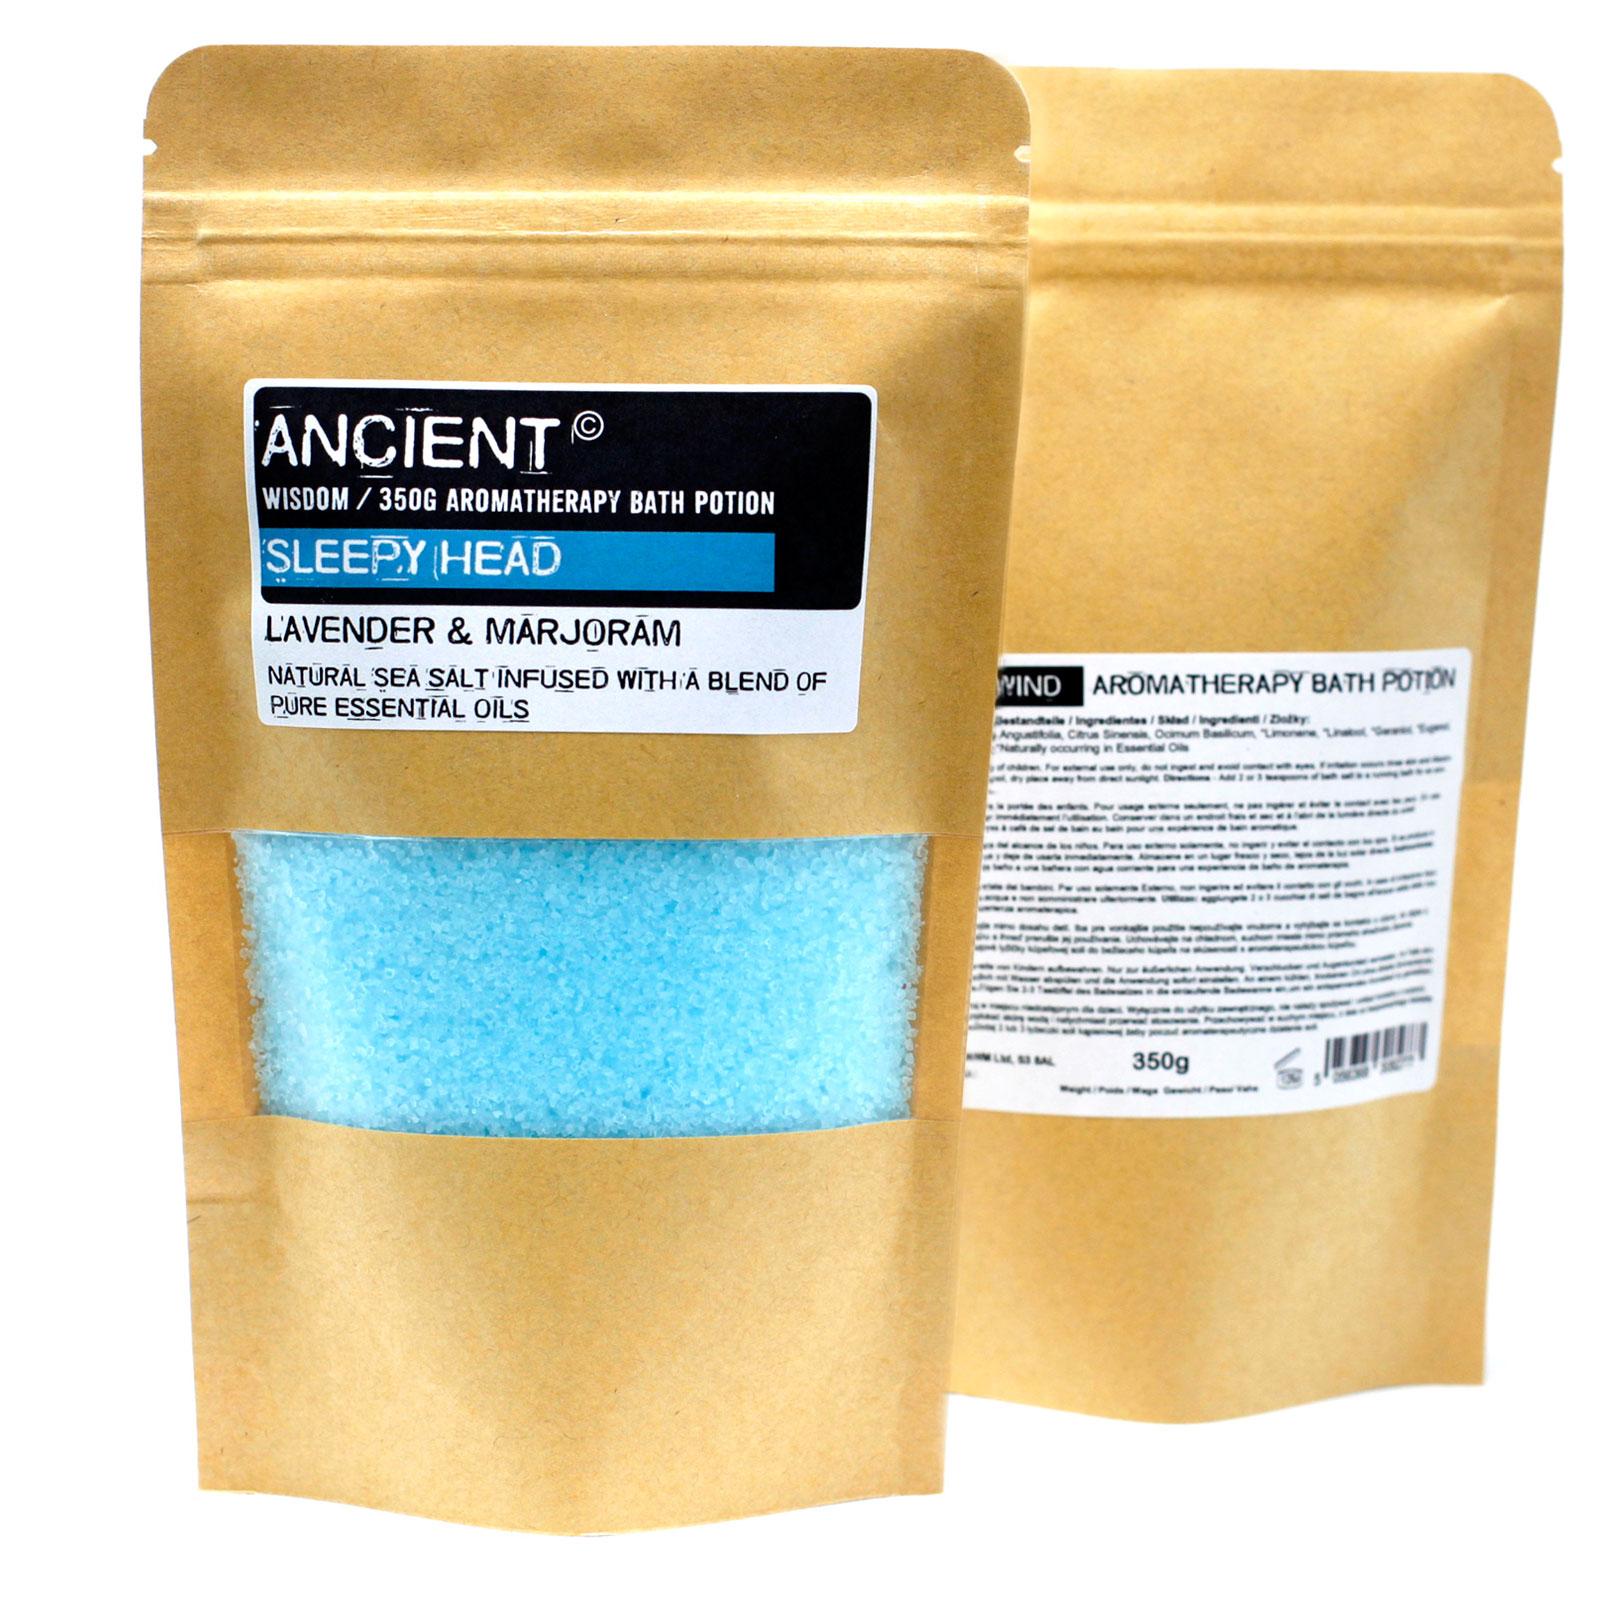 Aromatherapy Bath Potion in Kraft Bag 350g Sleepy Head